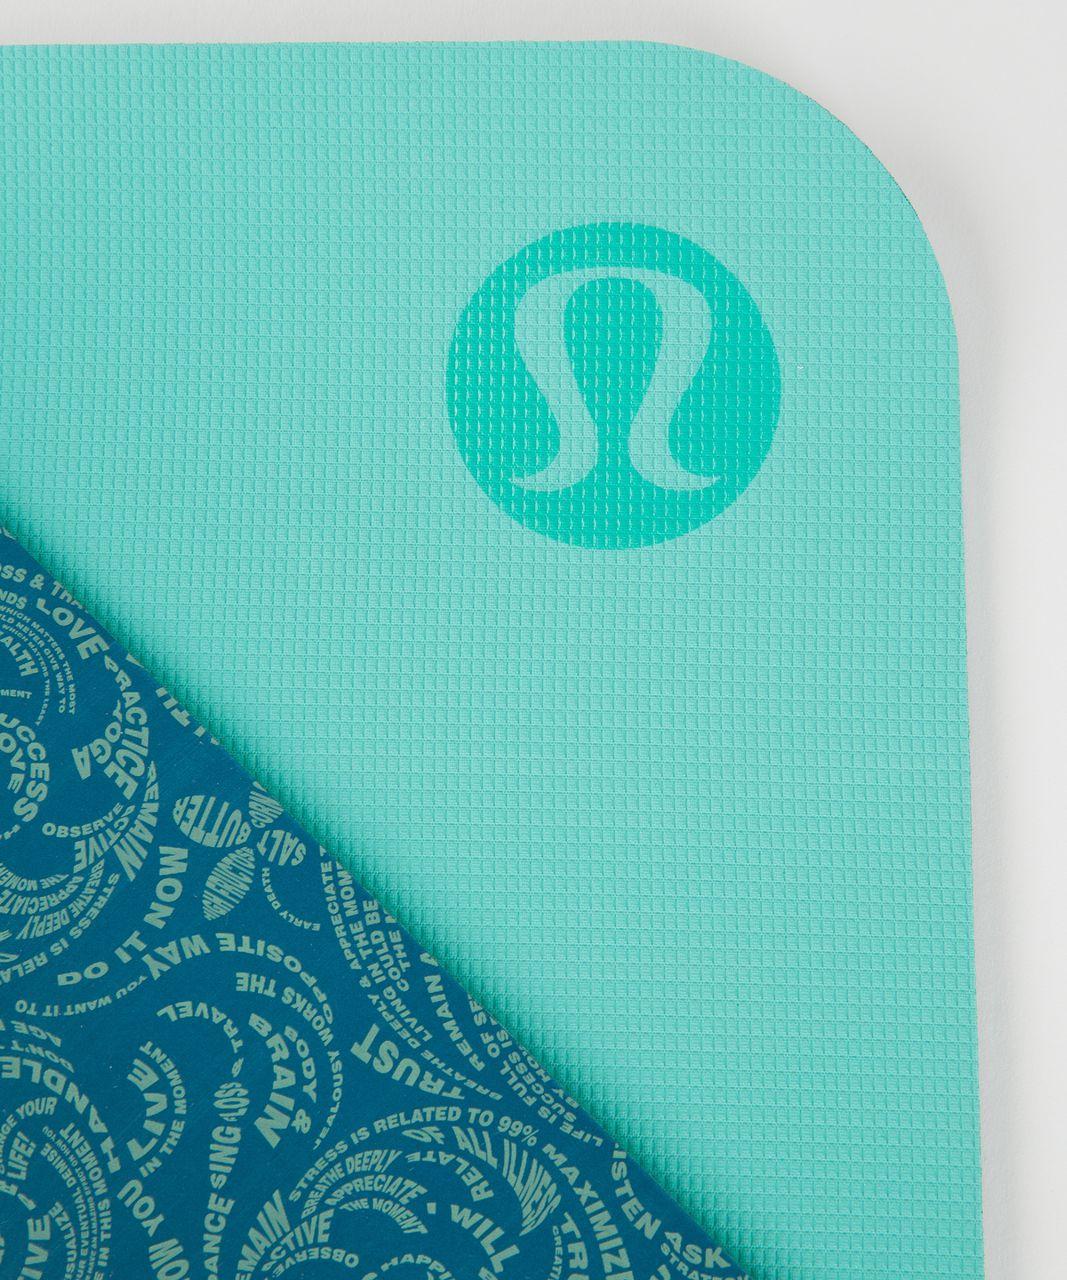 Lululemon The Reversible Mat 5mm - Maxi Foli Manifesto Tofino Teal Bali Breeze / Bali Breeze